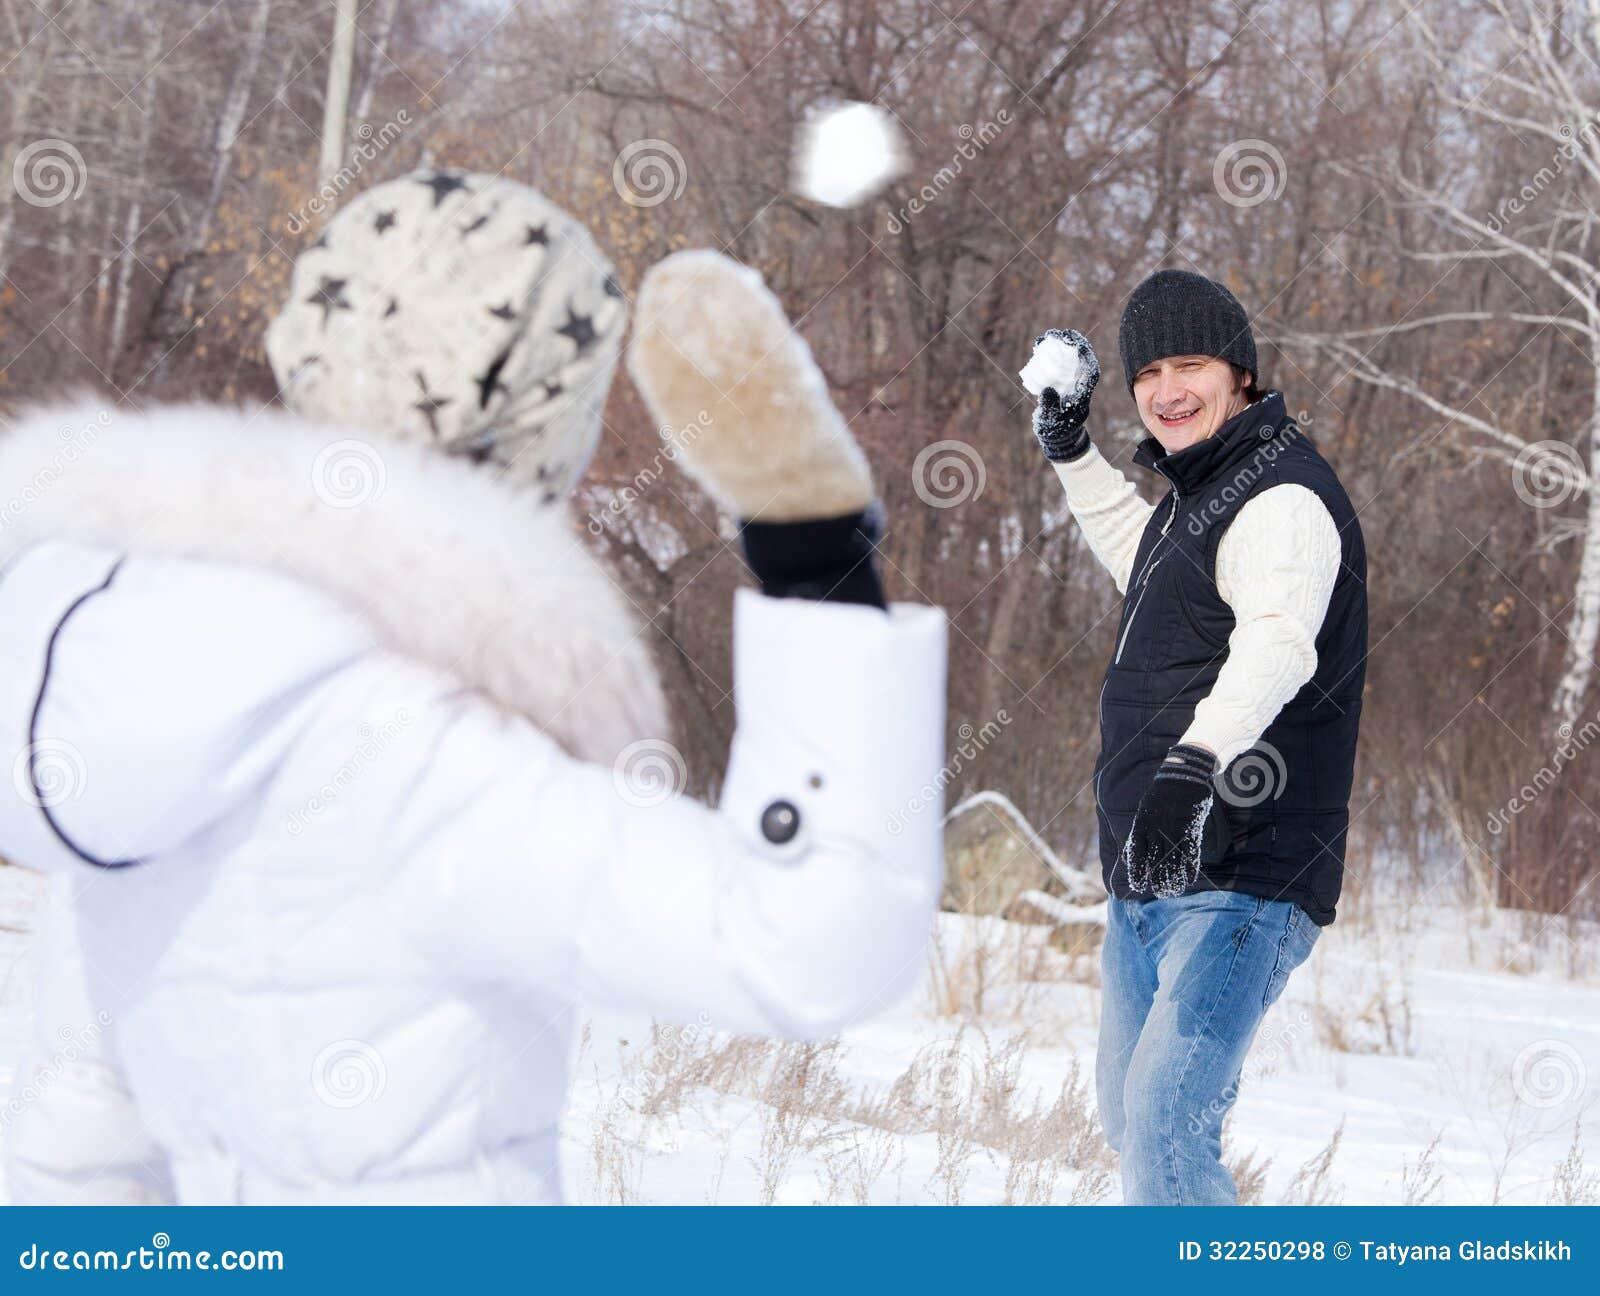 Couple snowballing